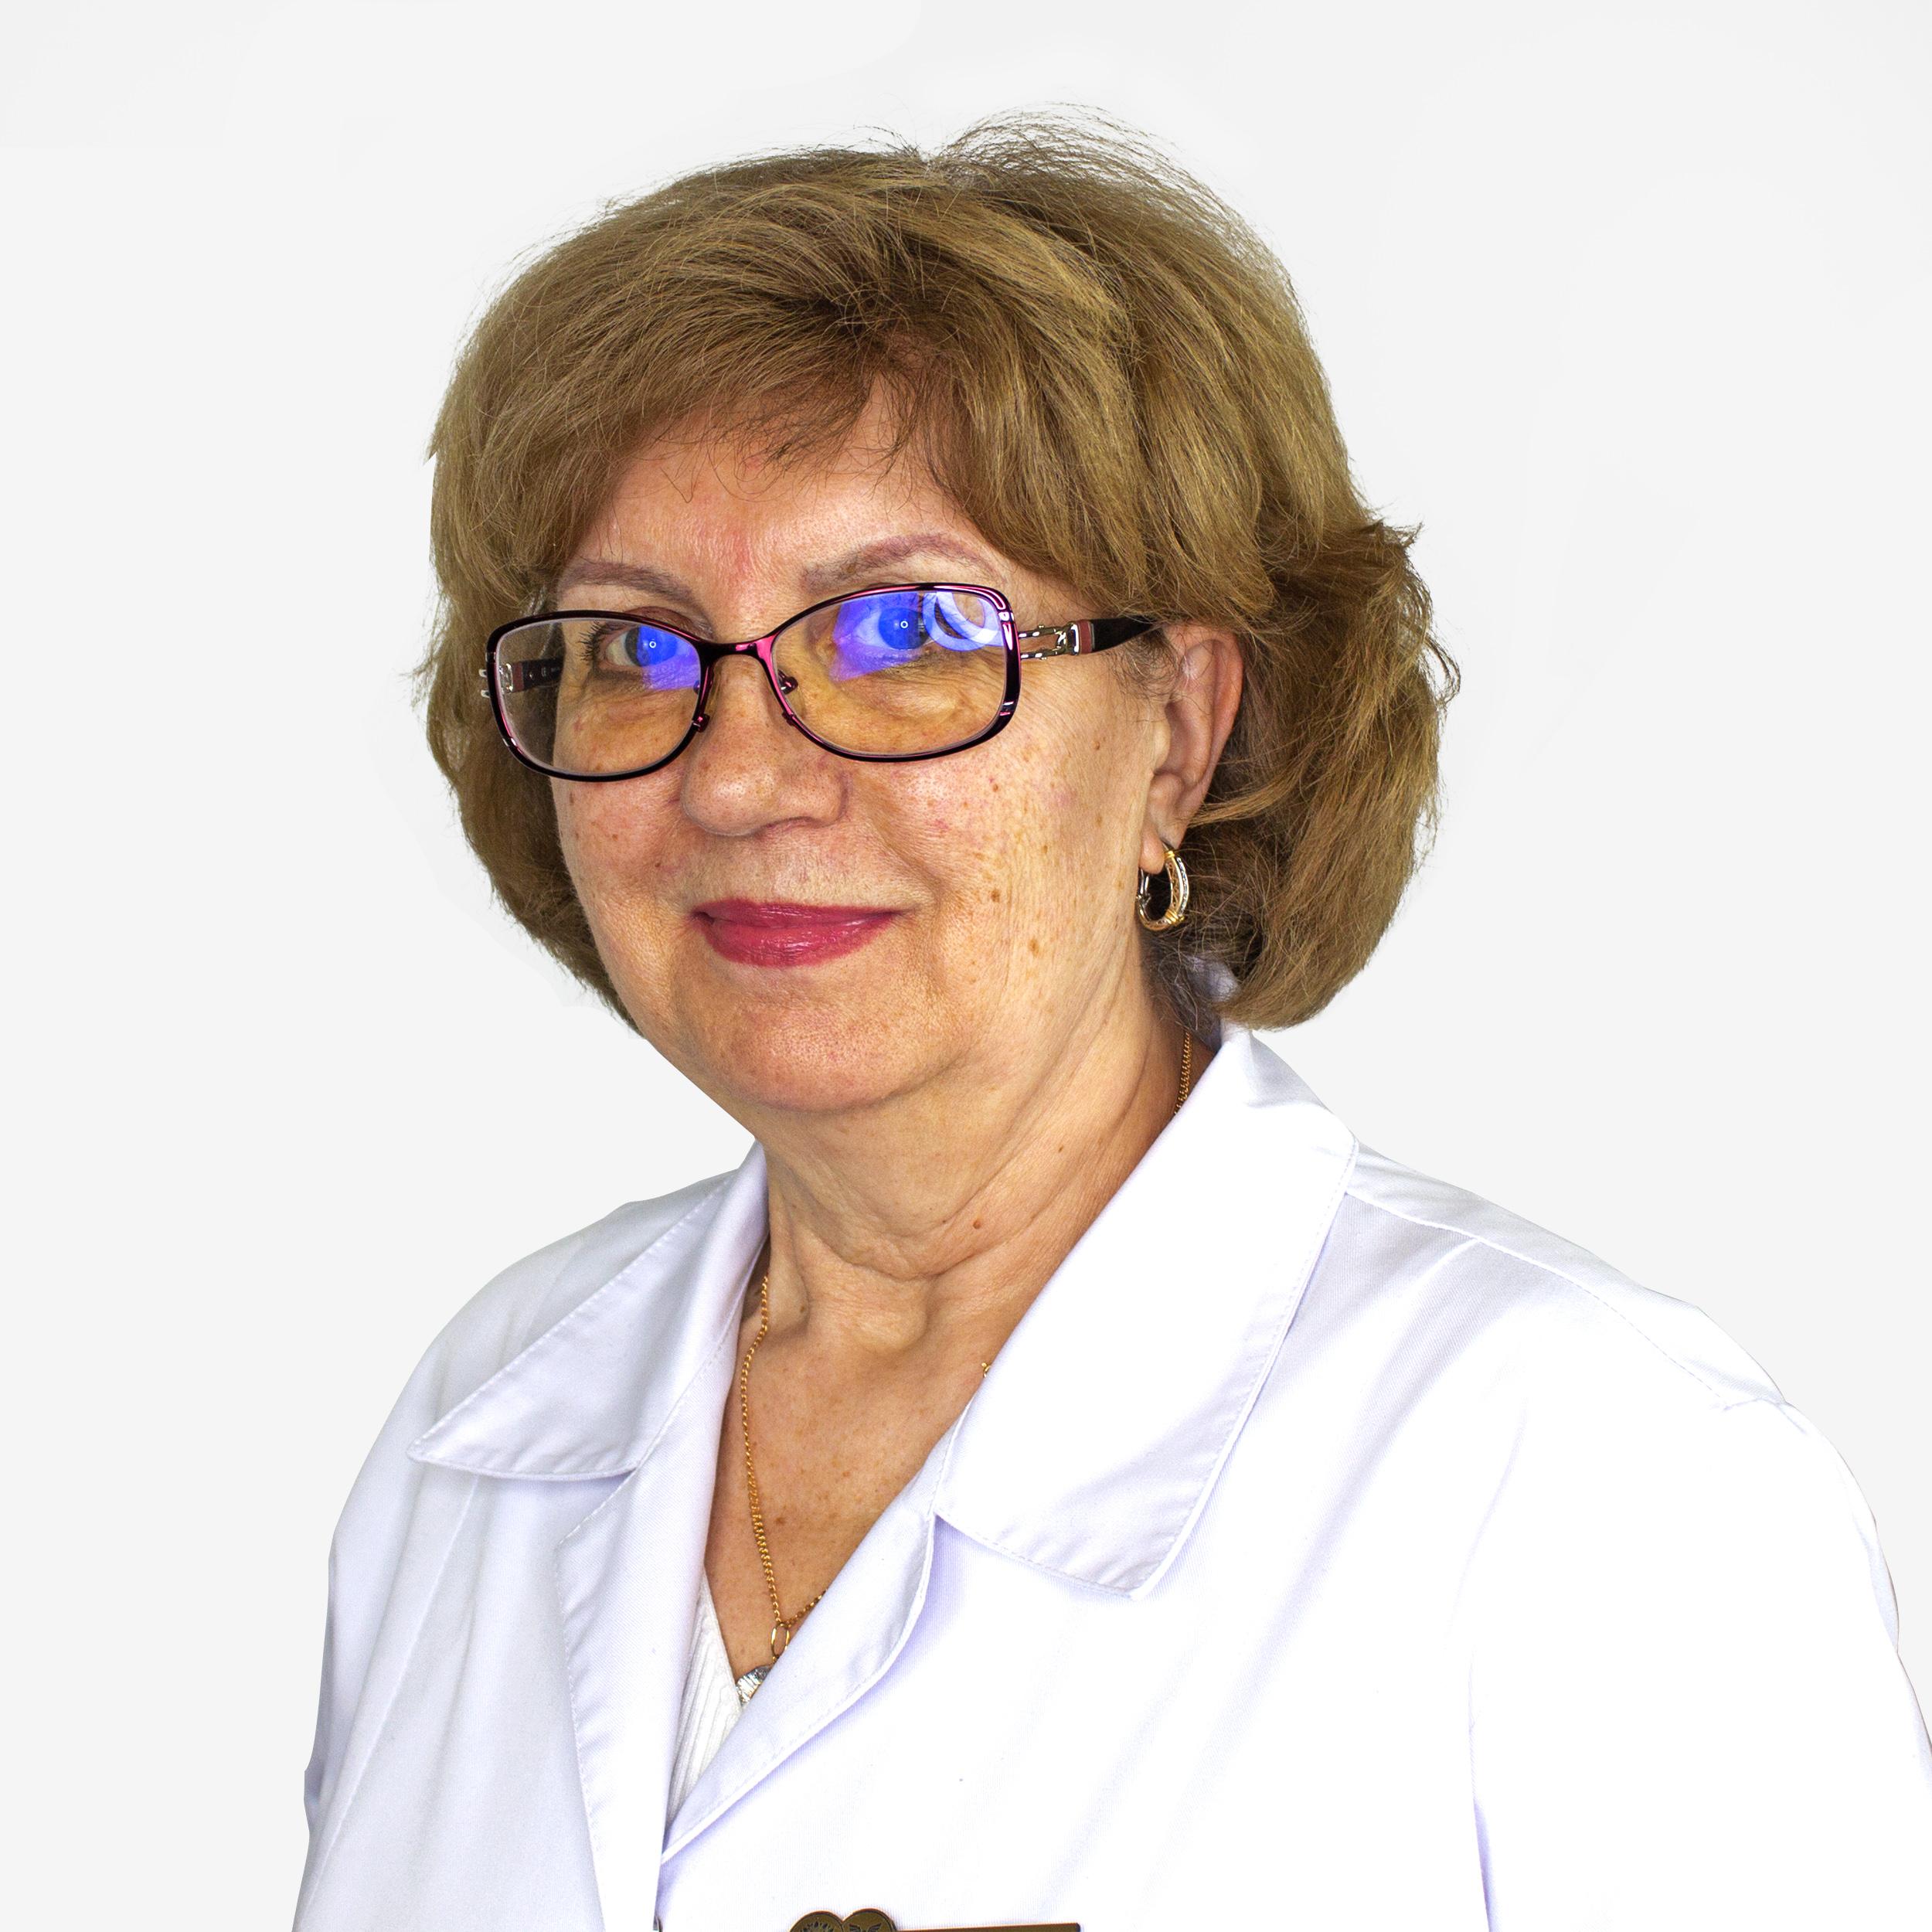 Богачева Ирина Дмитриевна